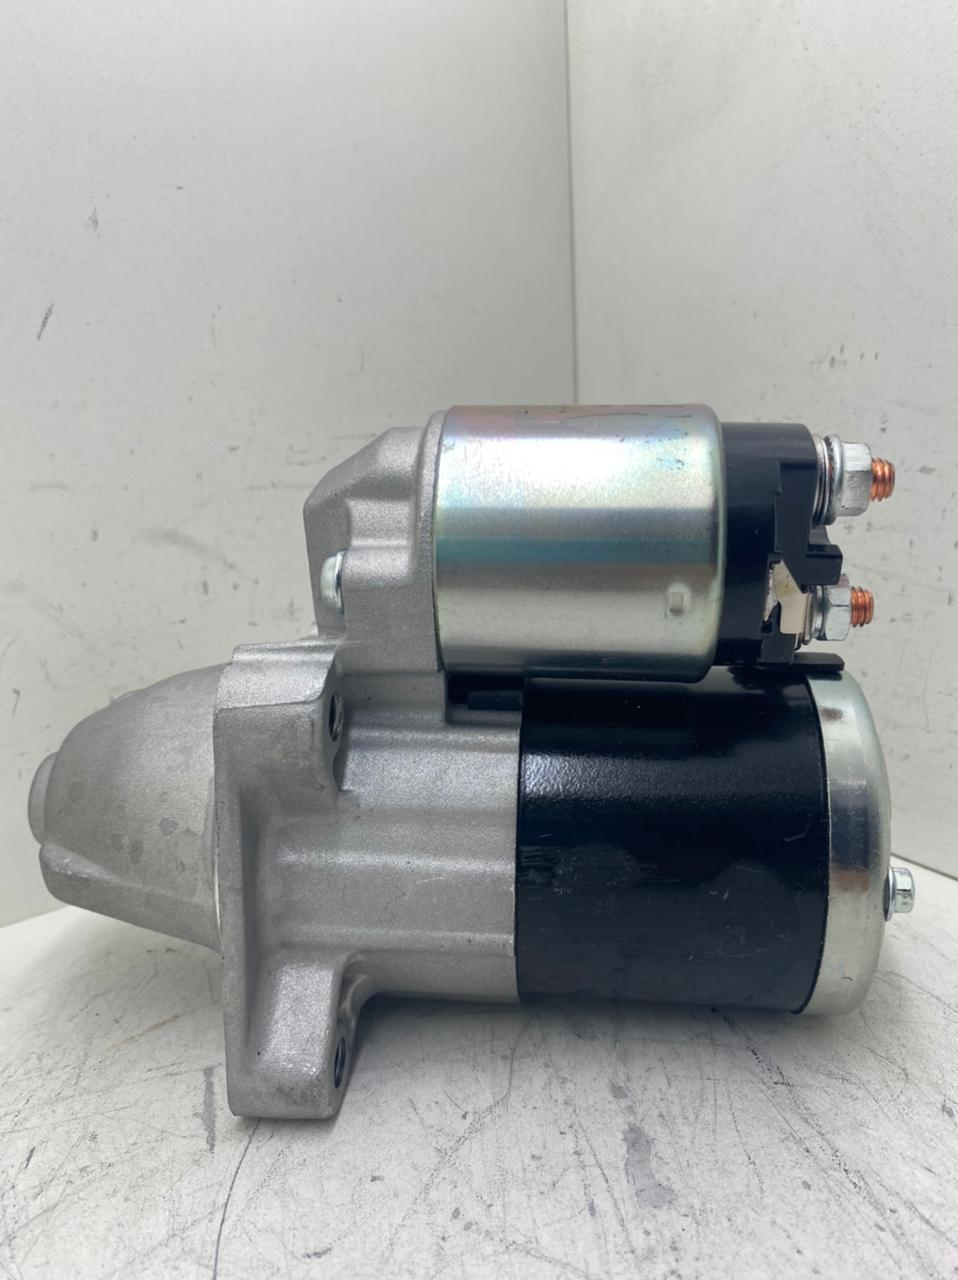 Motor de arranque FORD NEW FIESTA FOCUS ECOSPORT MITSUBISHI 12V 11 DENTES 0001108408 1SC82906 CN1511000CA M0T33571ZC AE8T11000AB E 20550 D 20313  AEC11031